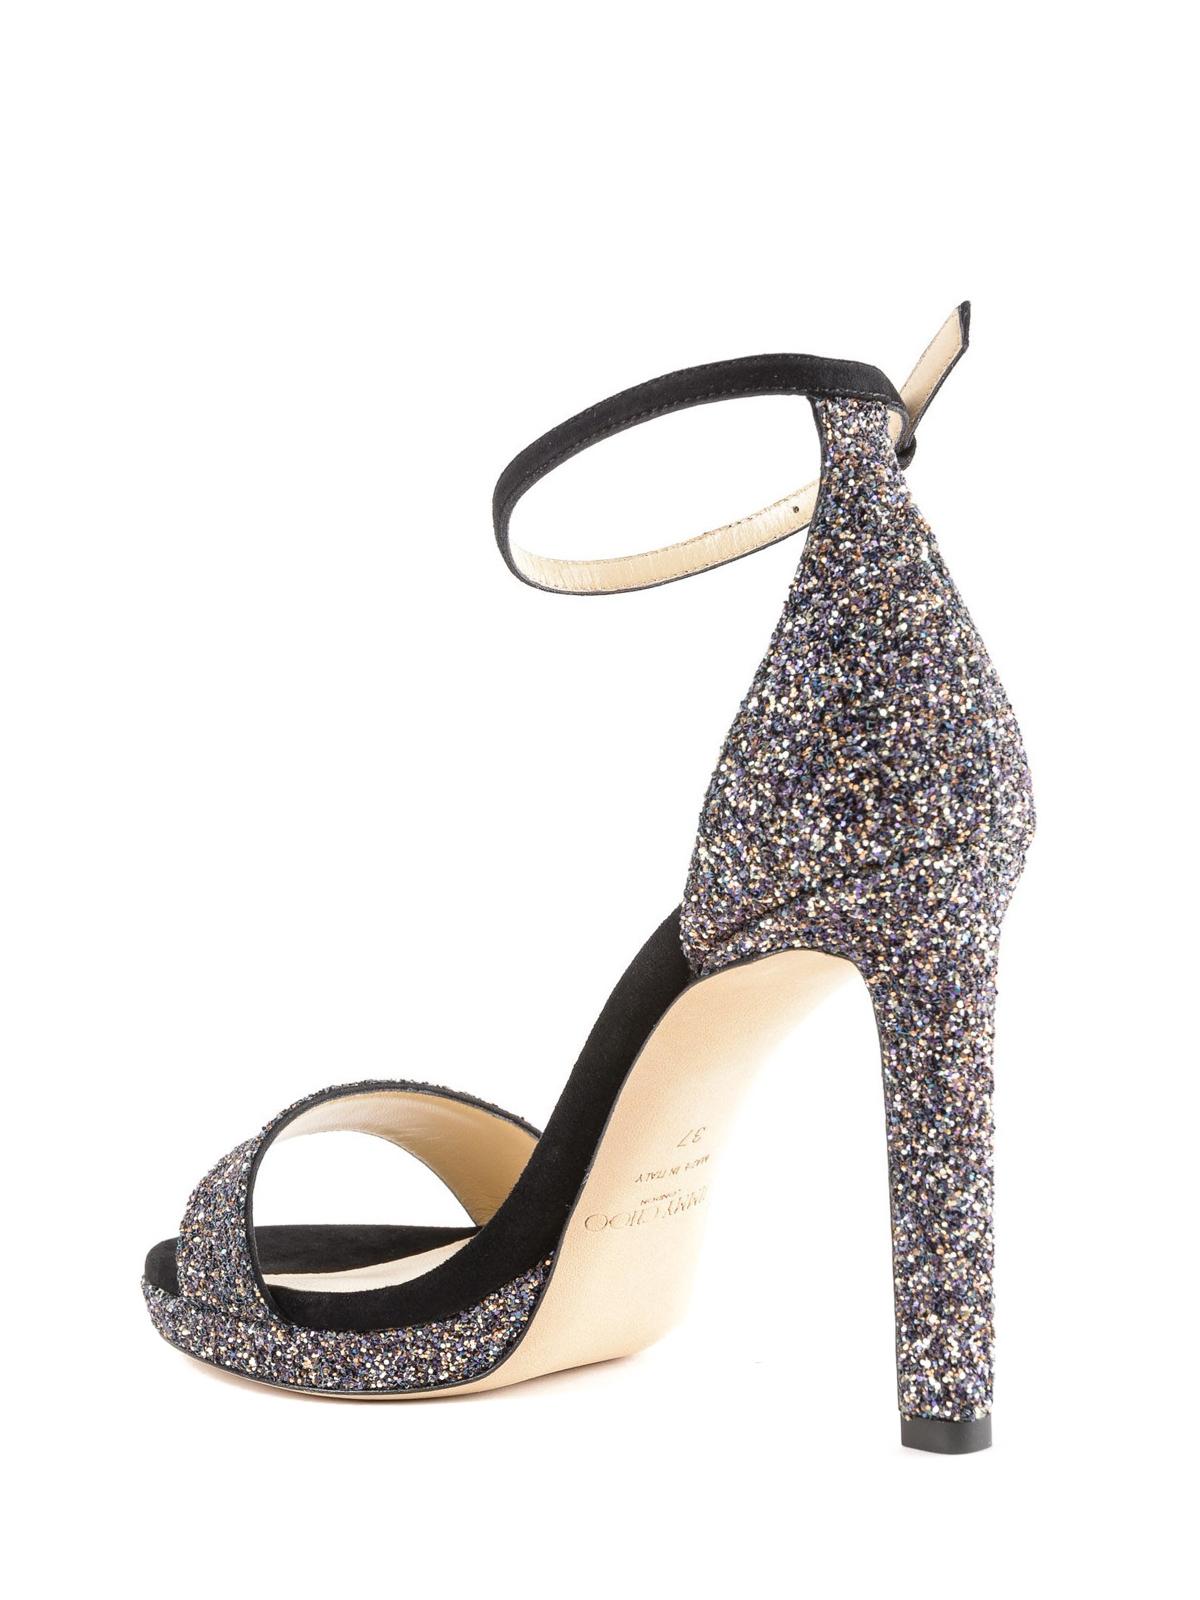 c18f7e9bf36d Jimmy Choo - Misty twilight glitter sandals - sandals - MISTY 100 ...